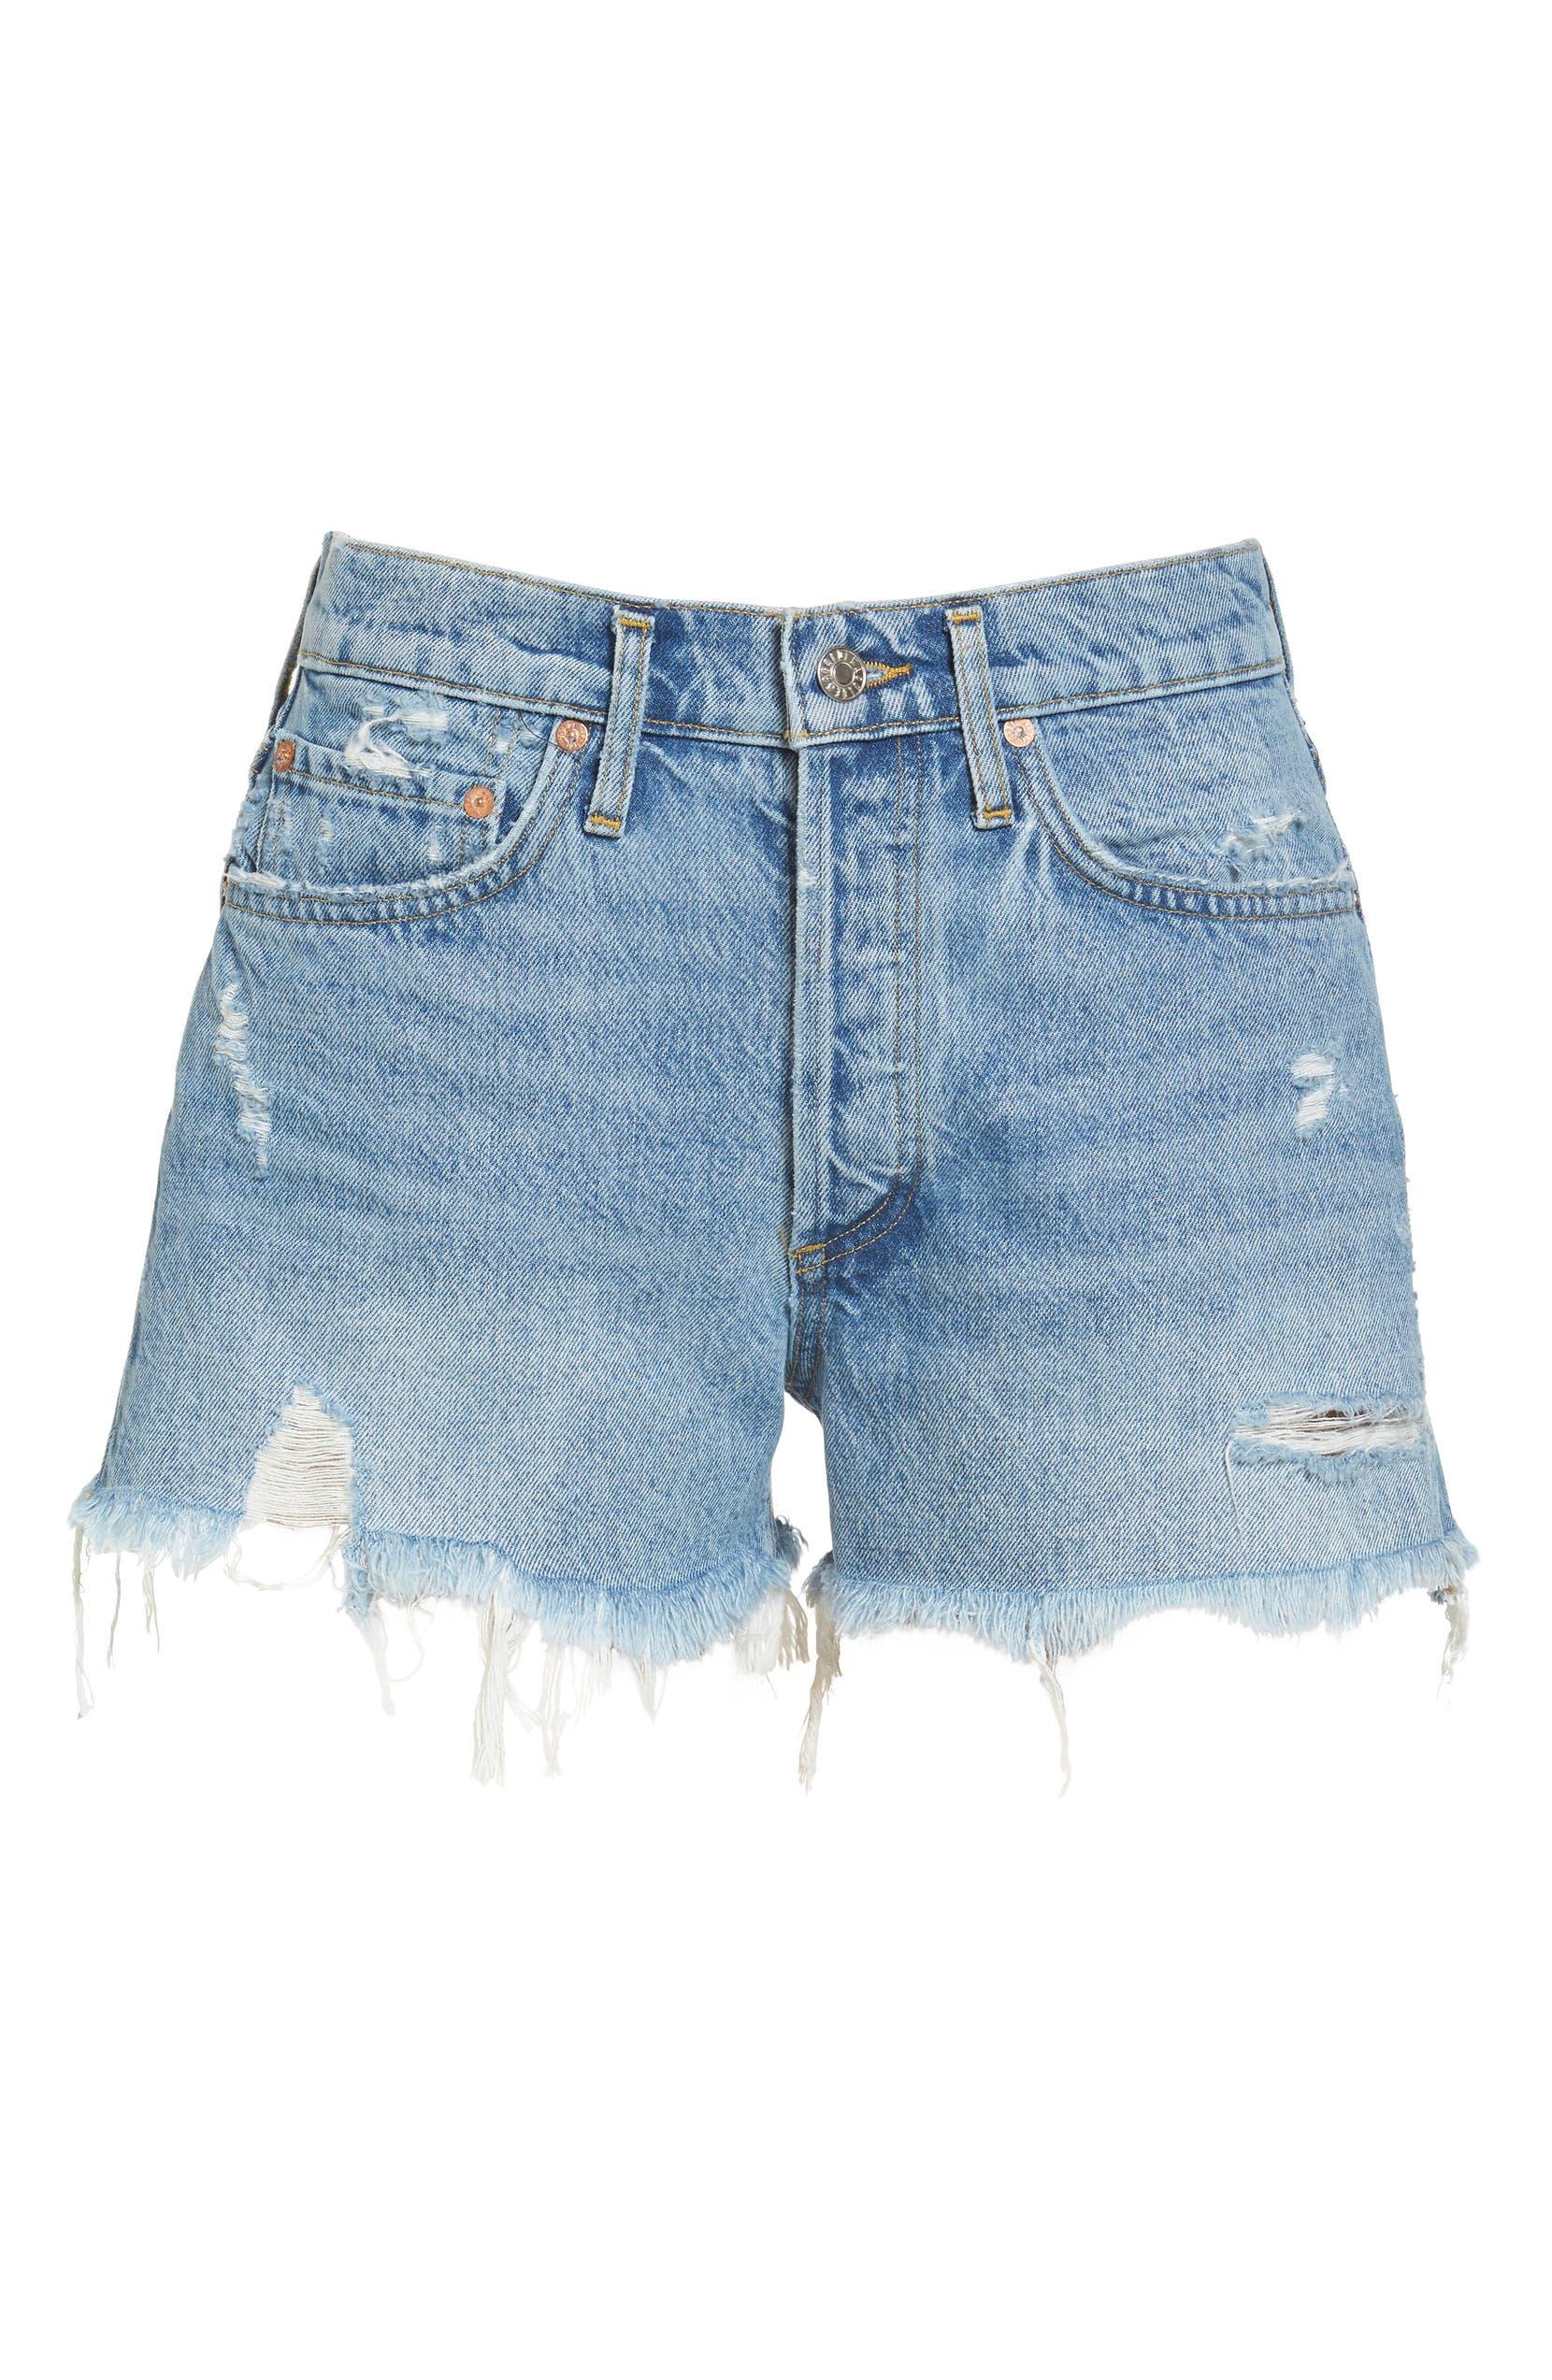 36907f2d53 AGOLDE Parker Distressed Denim Shorts (Swapmeet)   Nordstrom